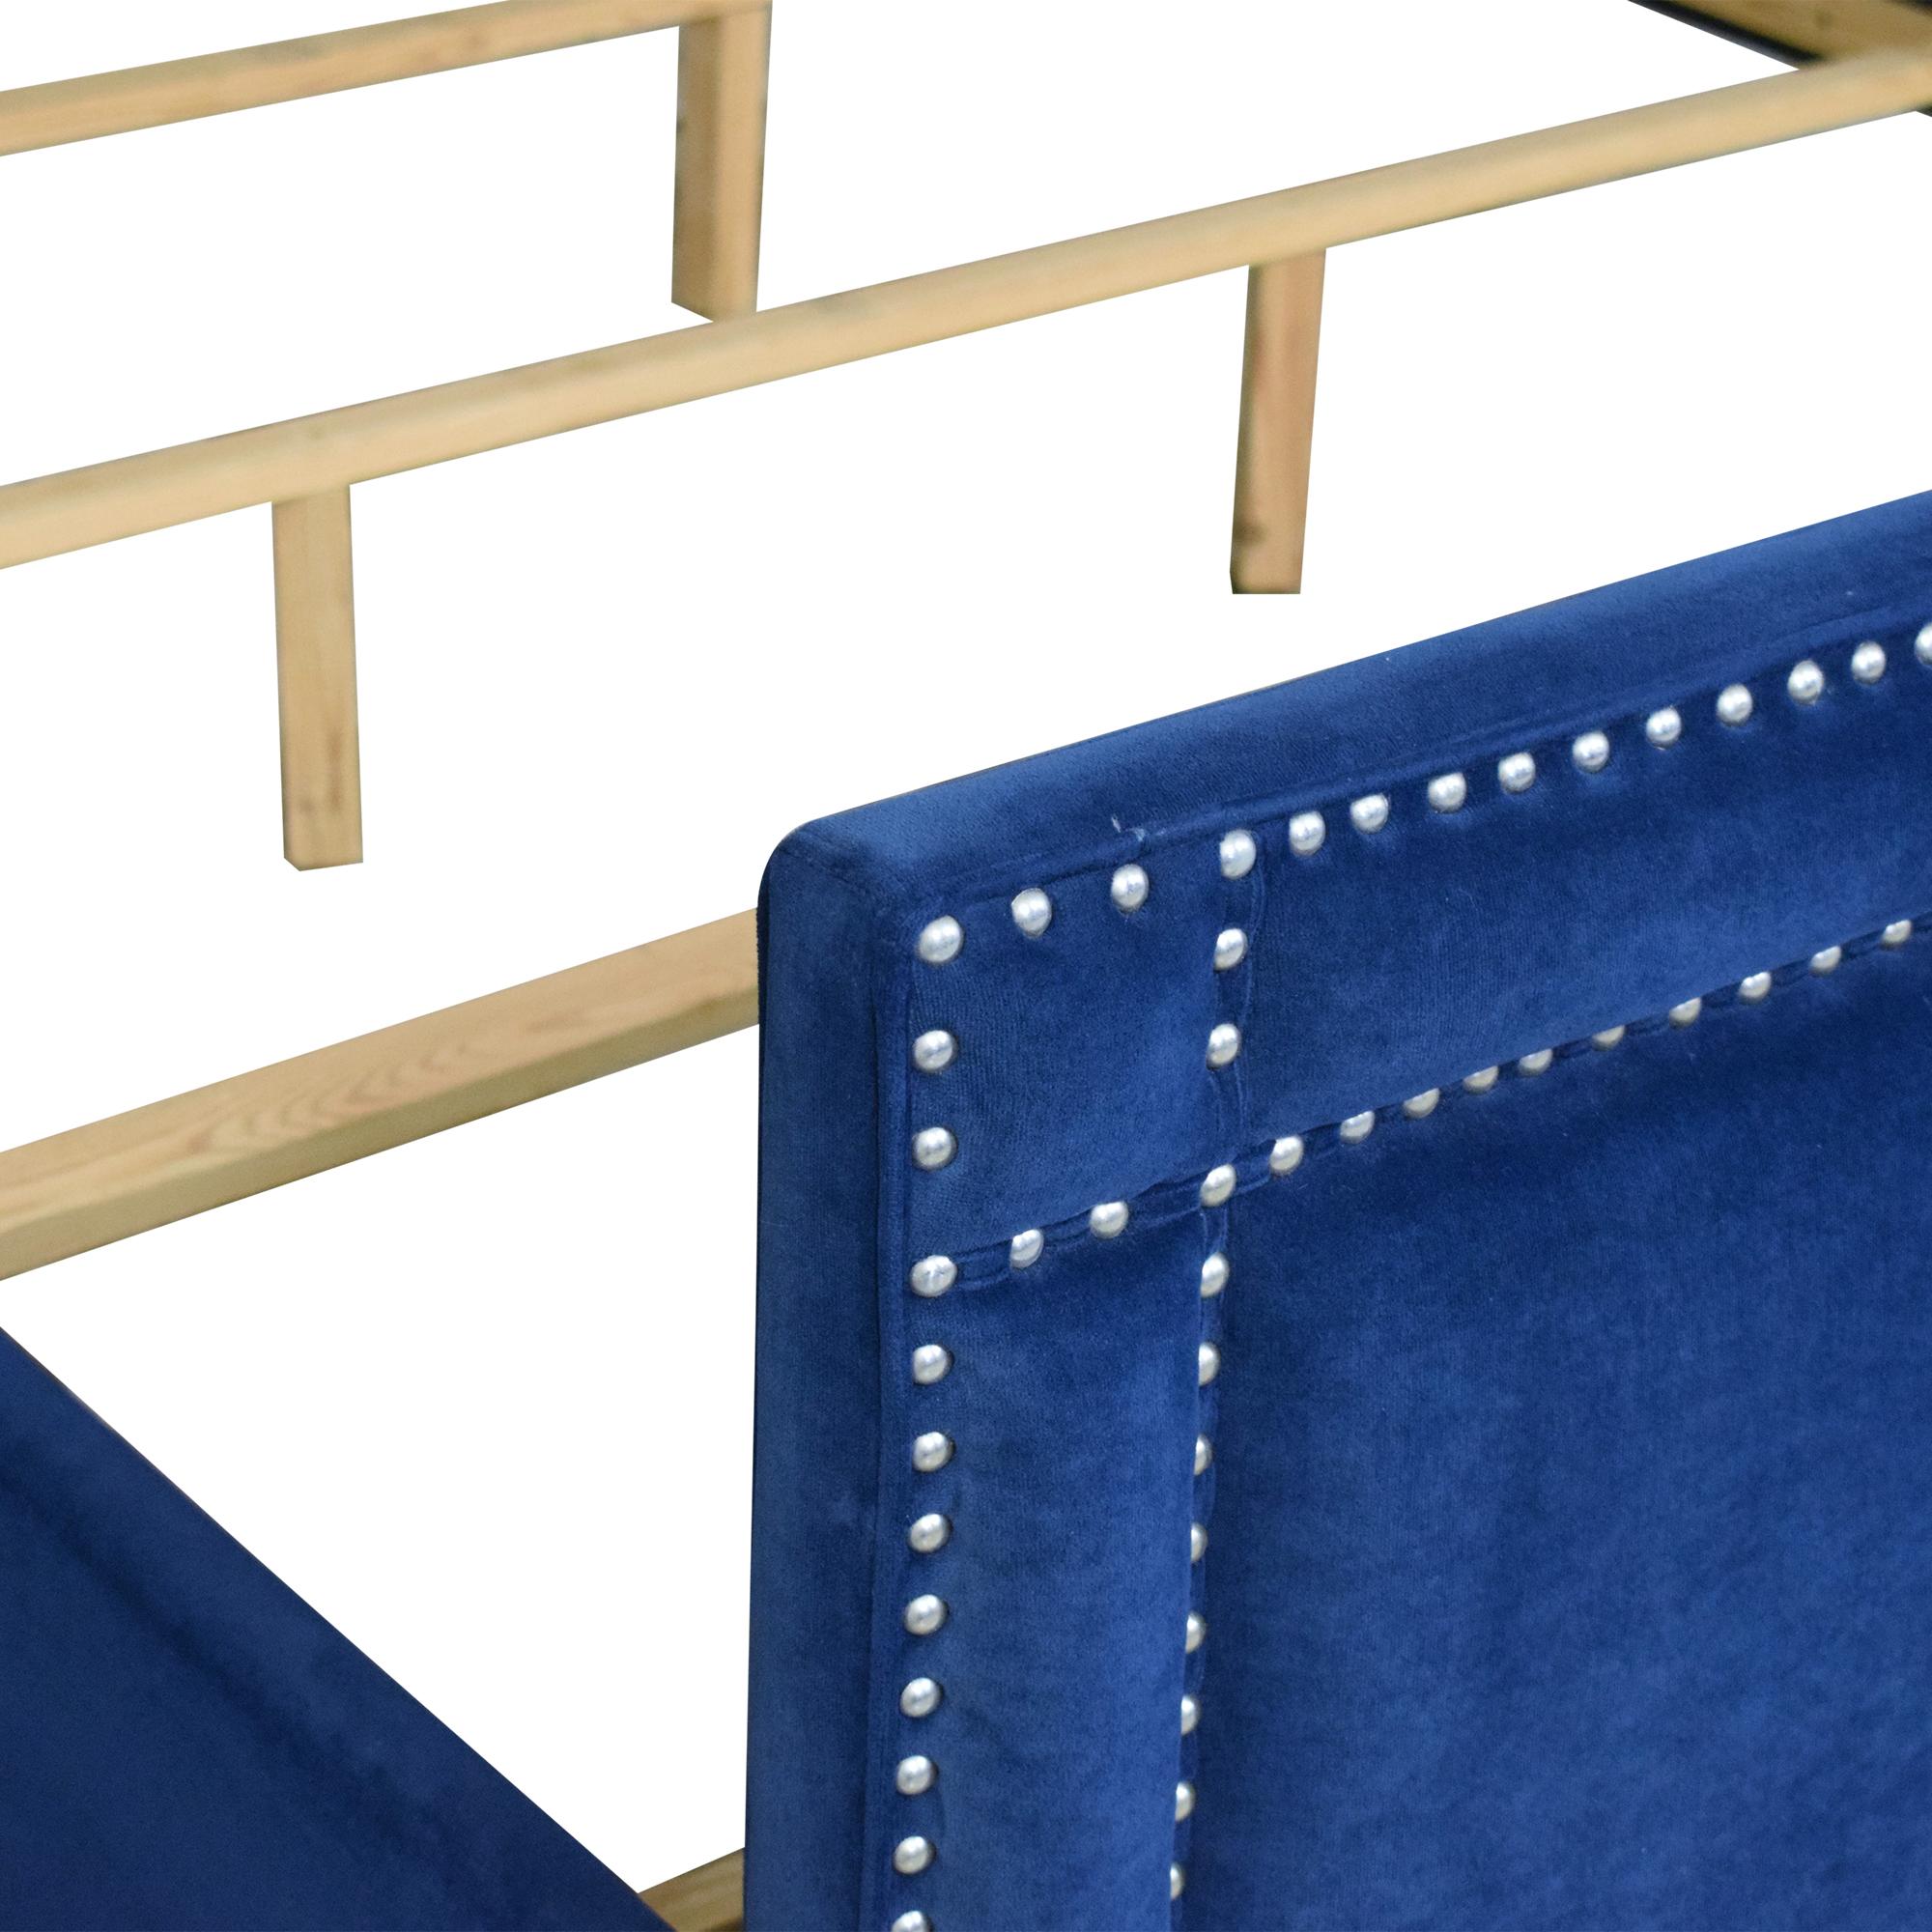 Wayfair Willa Arlo Interiors Janna Upholstered Low Profile King Bed / Beds